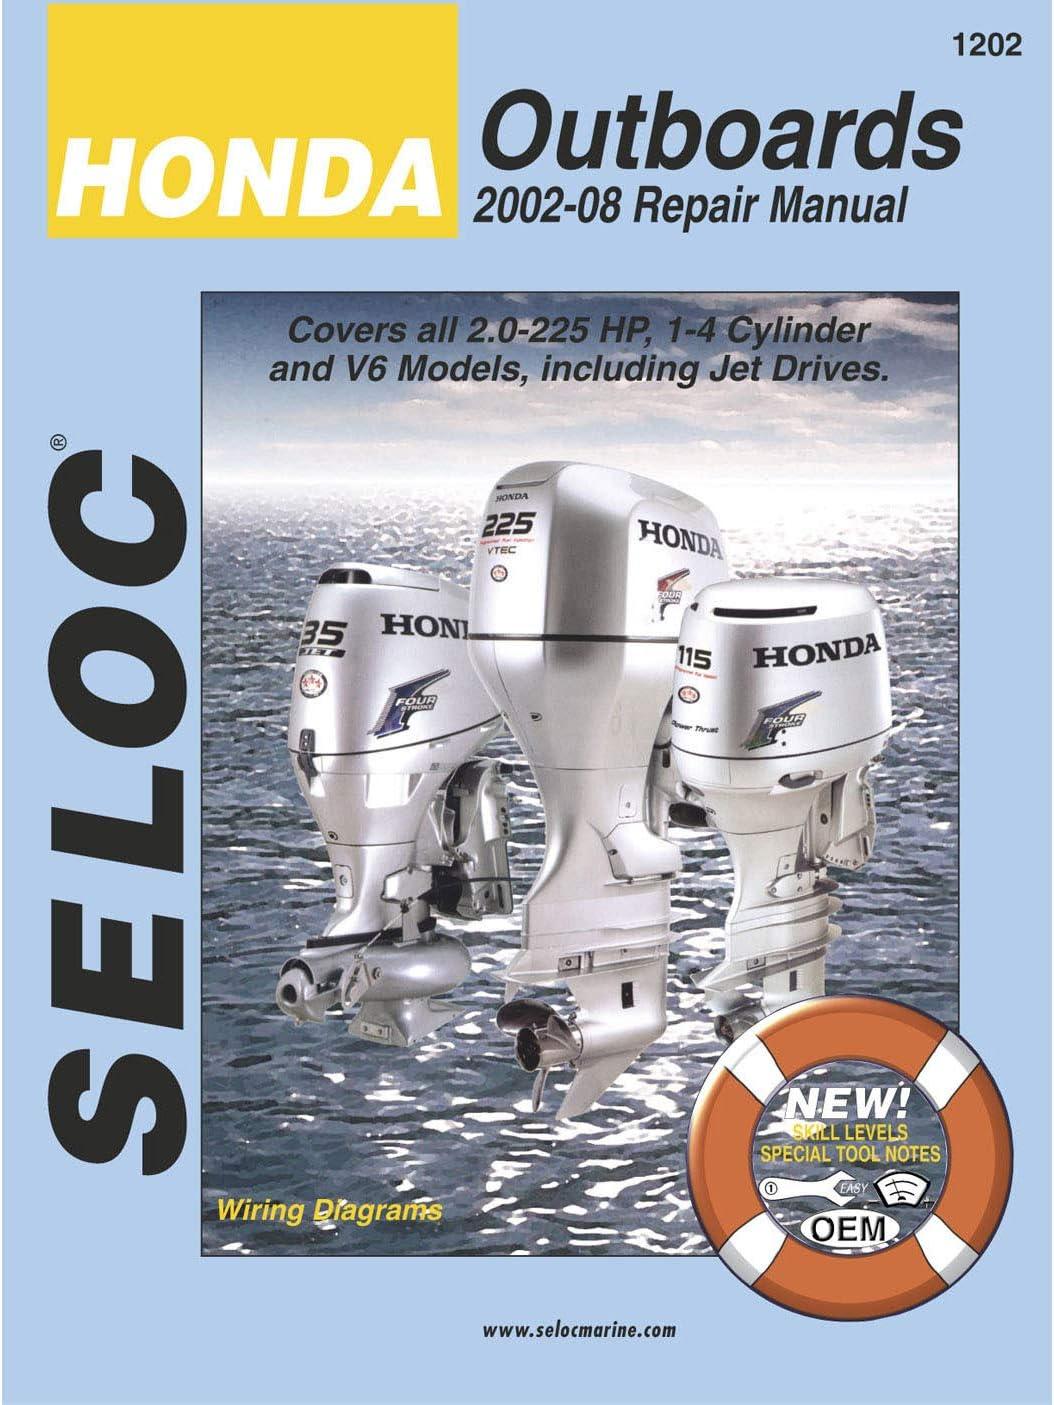 Sierra International Seloc Manual 18-01202 Honda Outboards Repair 2002-2014 2-225 HP 1-4 Cylinder & V6 Model Including Jet Drives